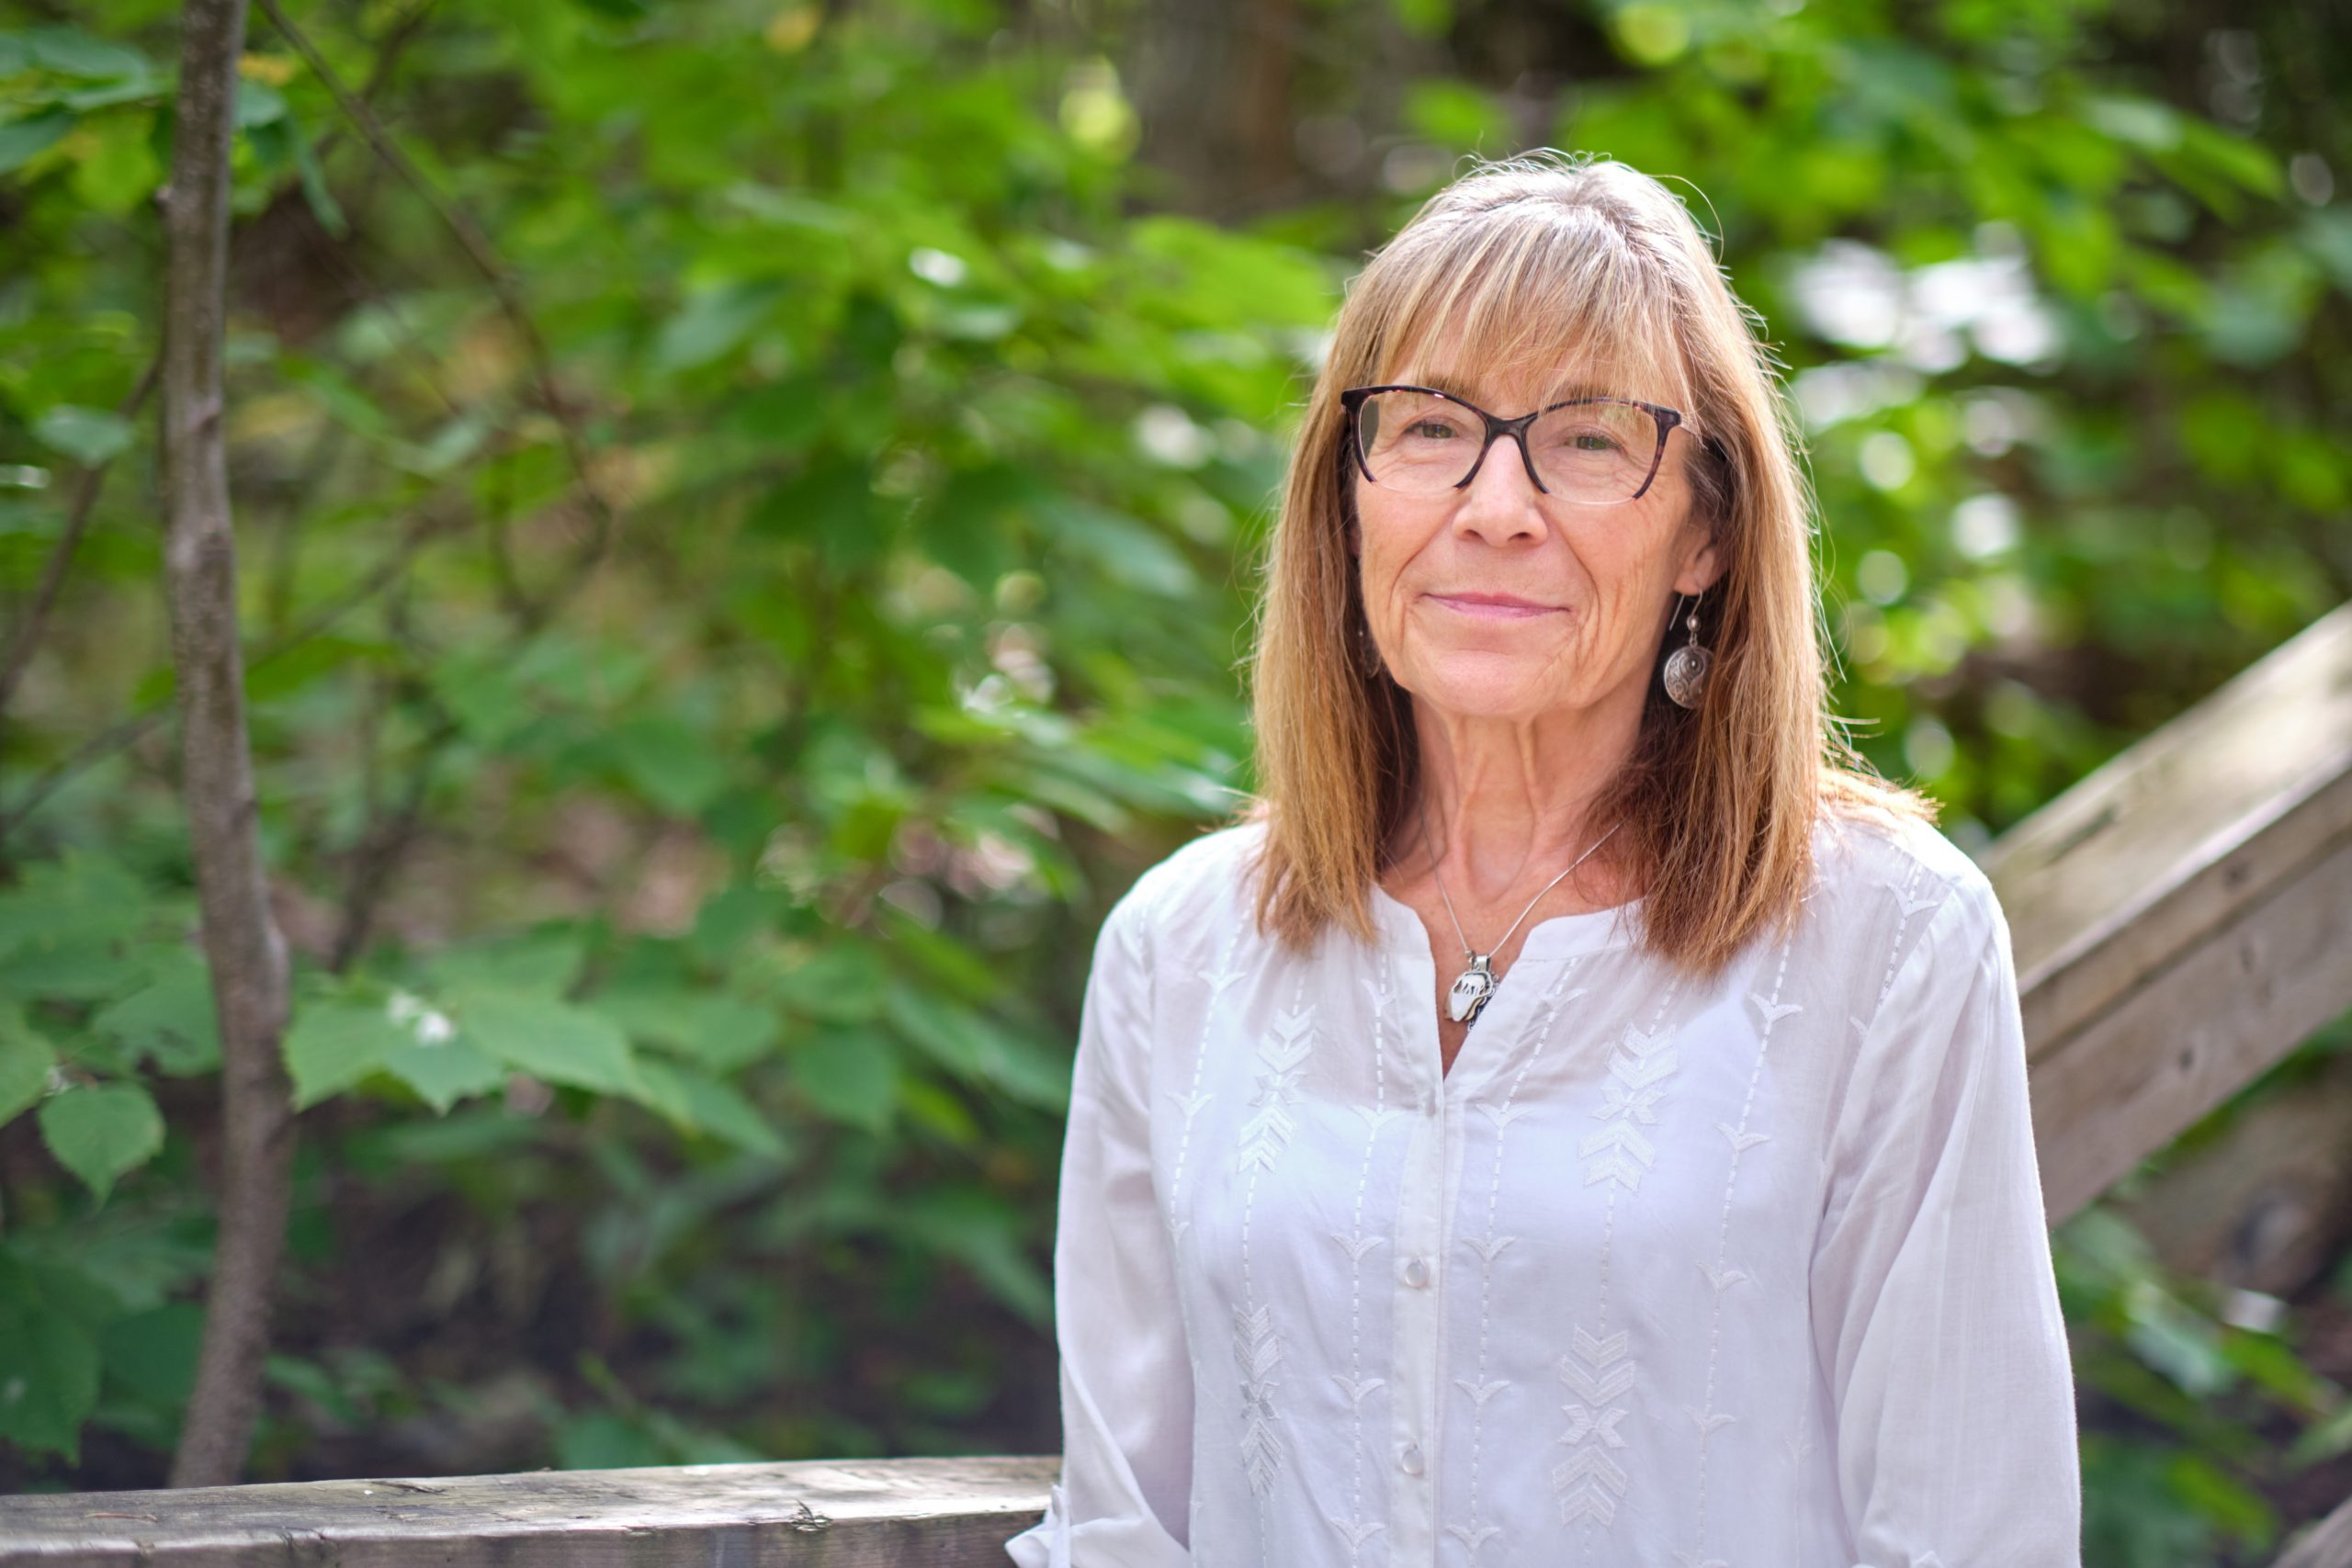 Wendy Creighton-Lacroix